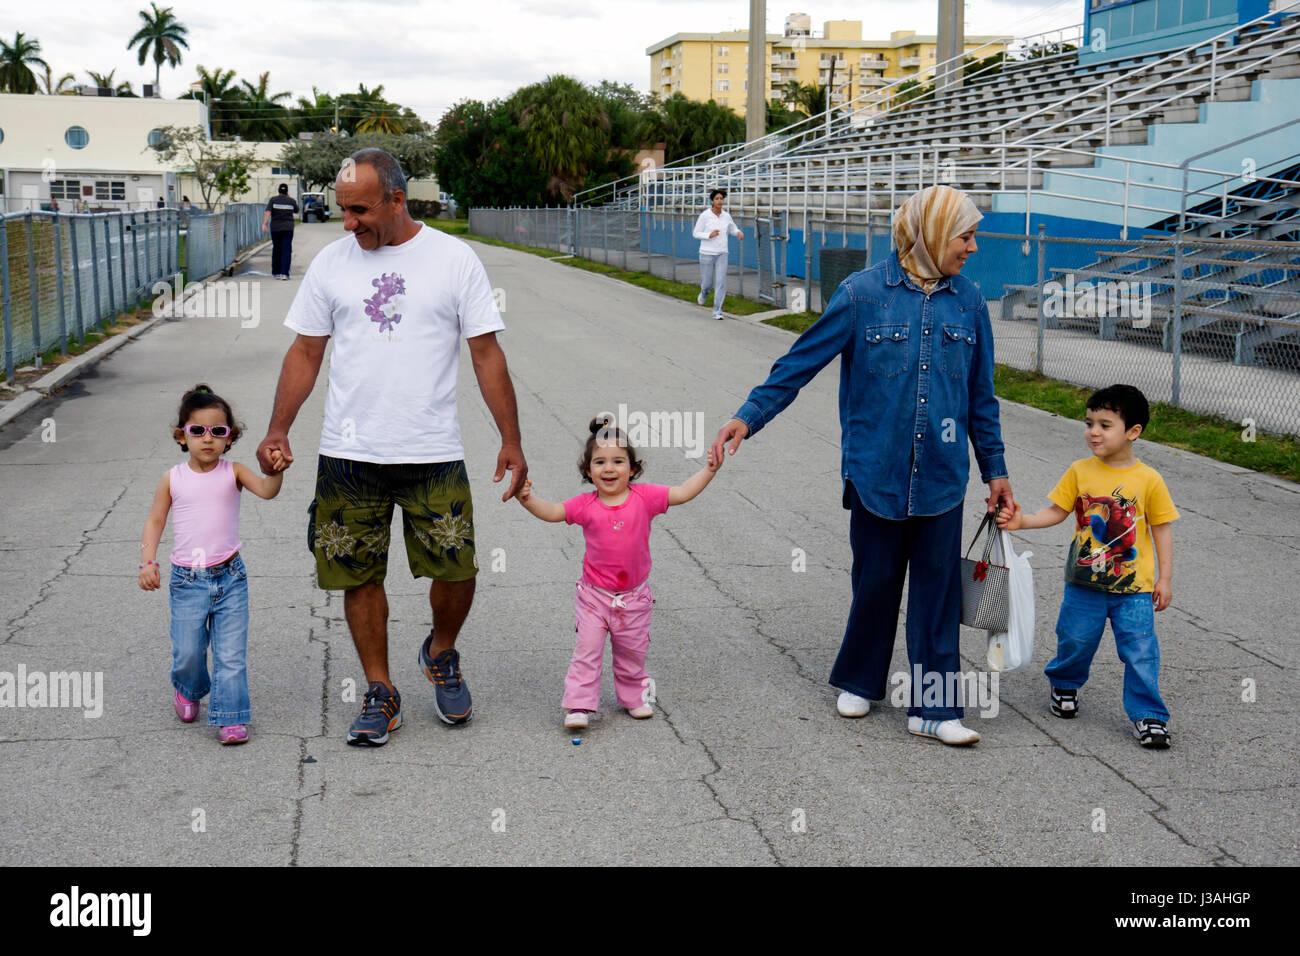 Miami Beach Florida Flamingo Park Muslim family man woman boy girls toddler preschooler walk exercise health ethnic - Stock Image